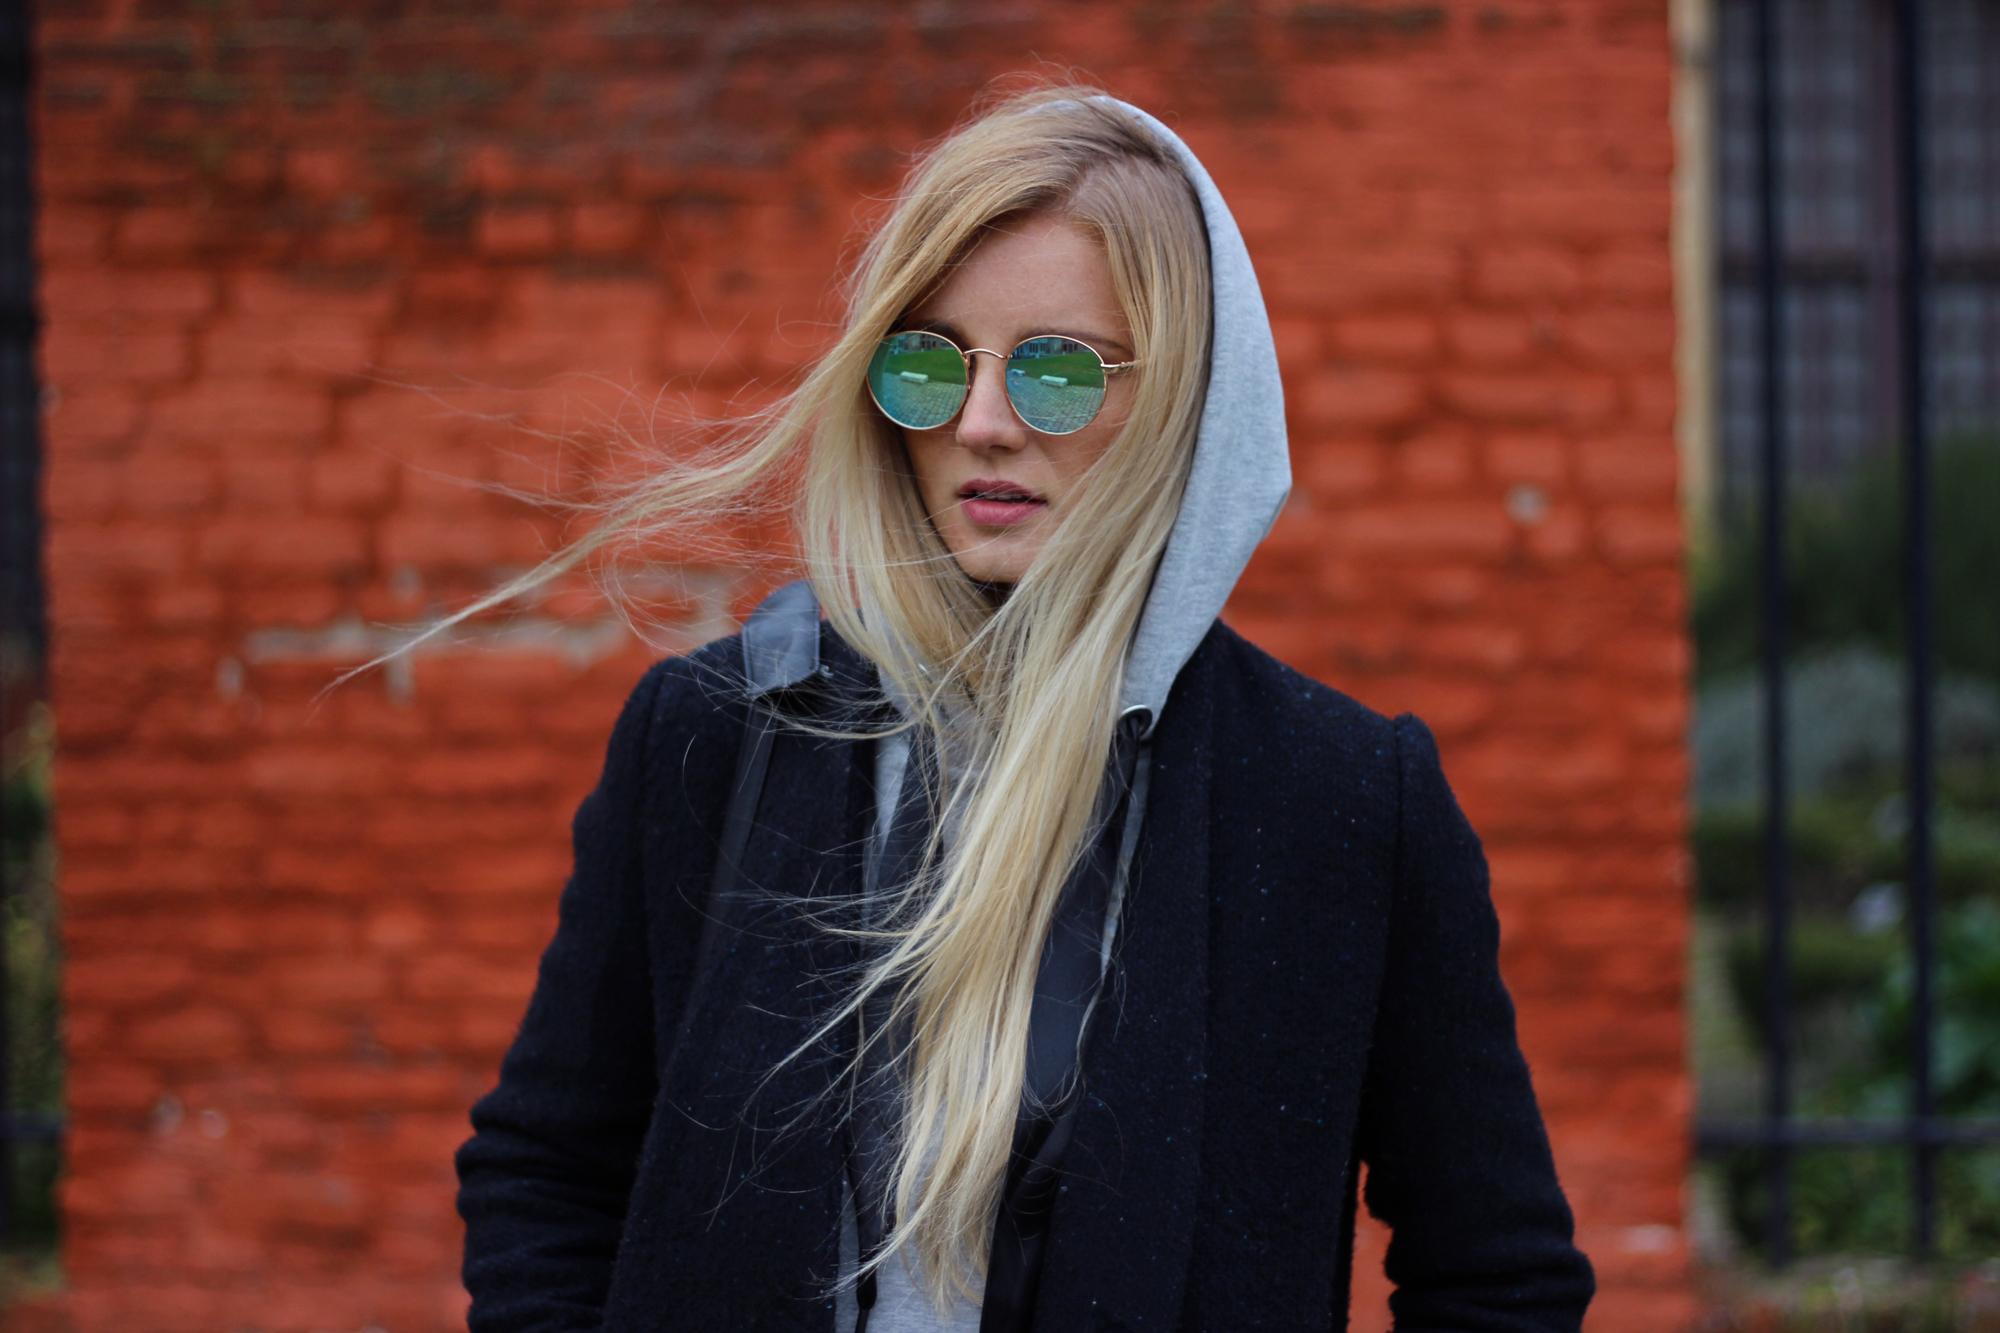 Blog mode manteau Asos lunettes Zara Stradivarius